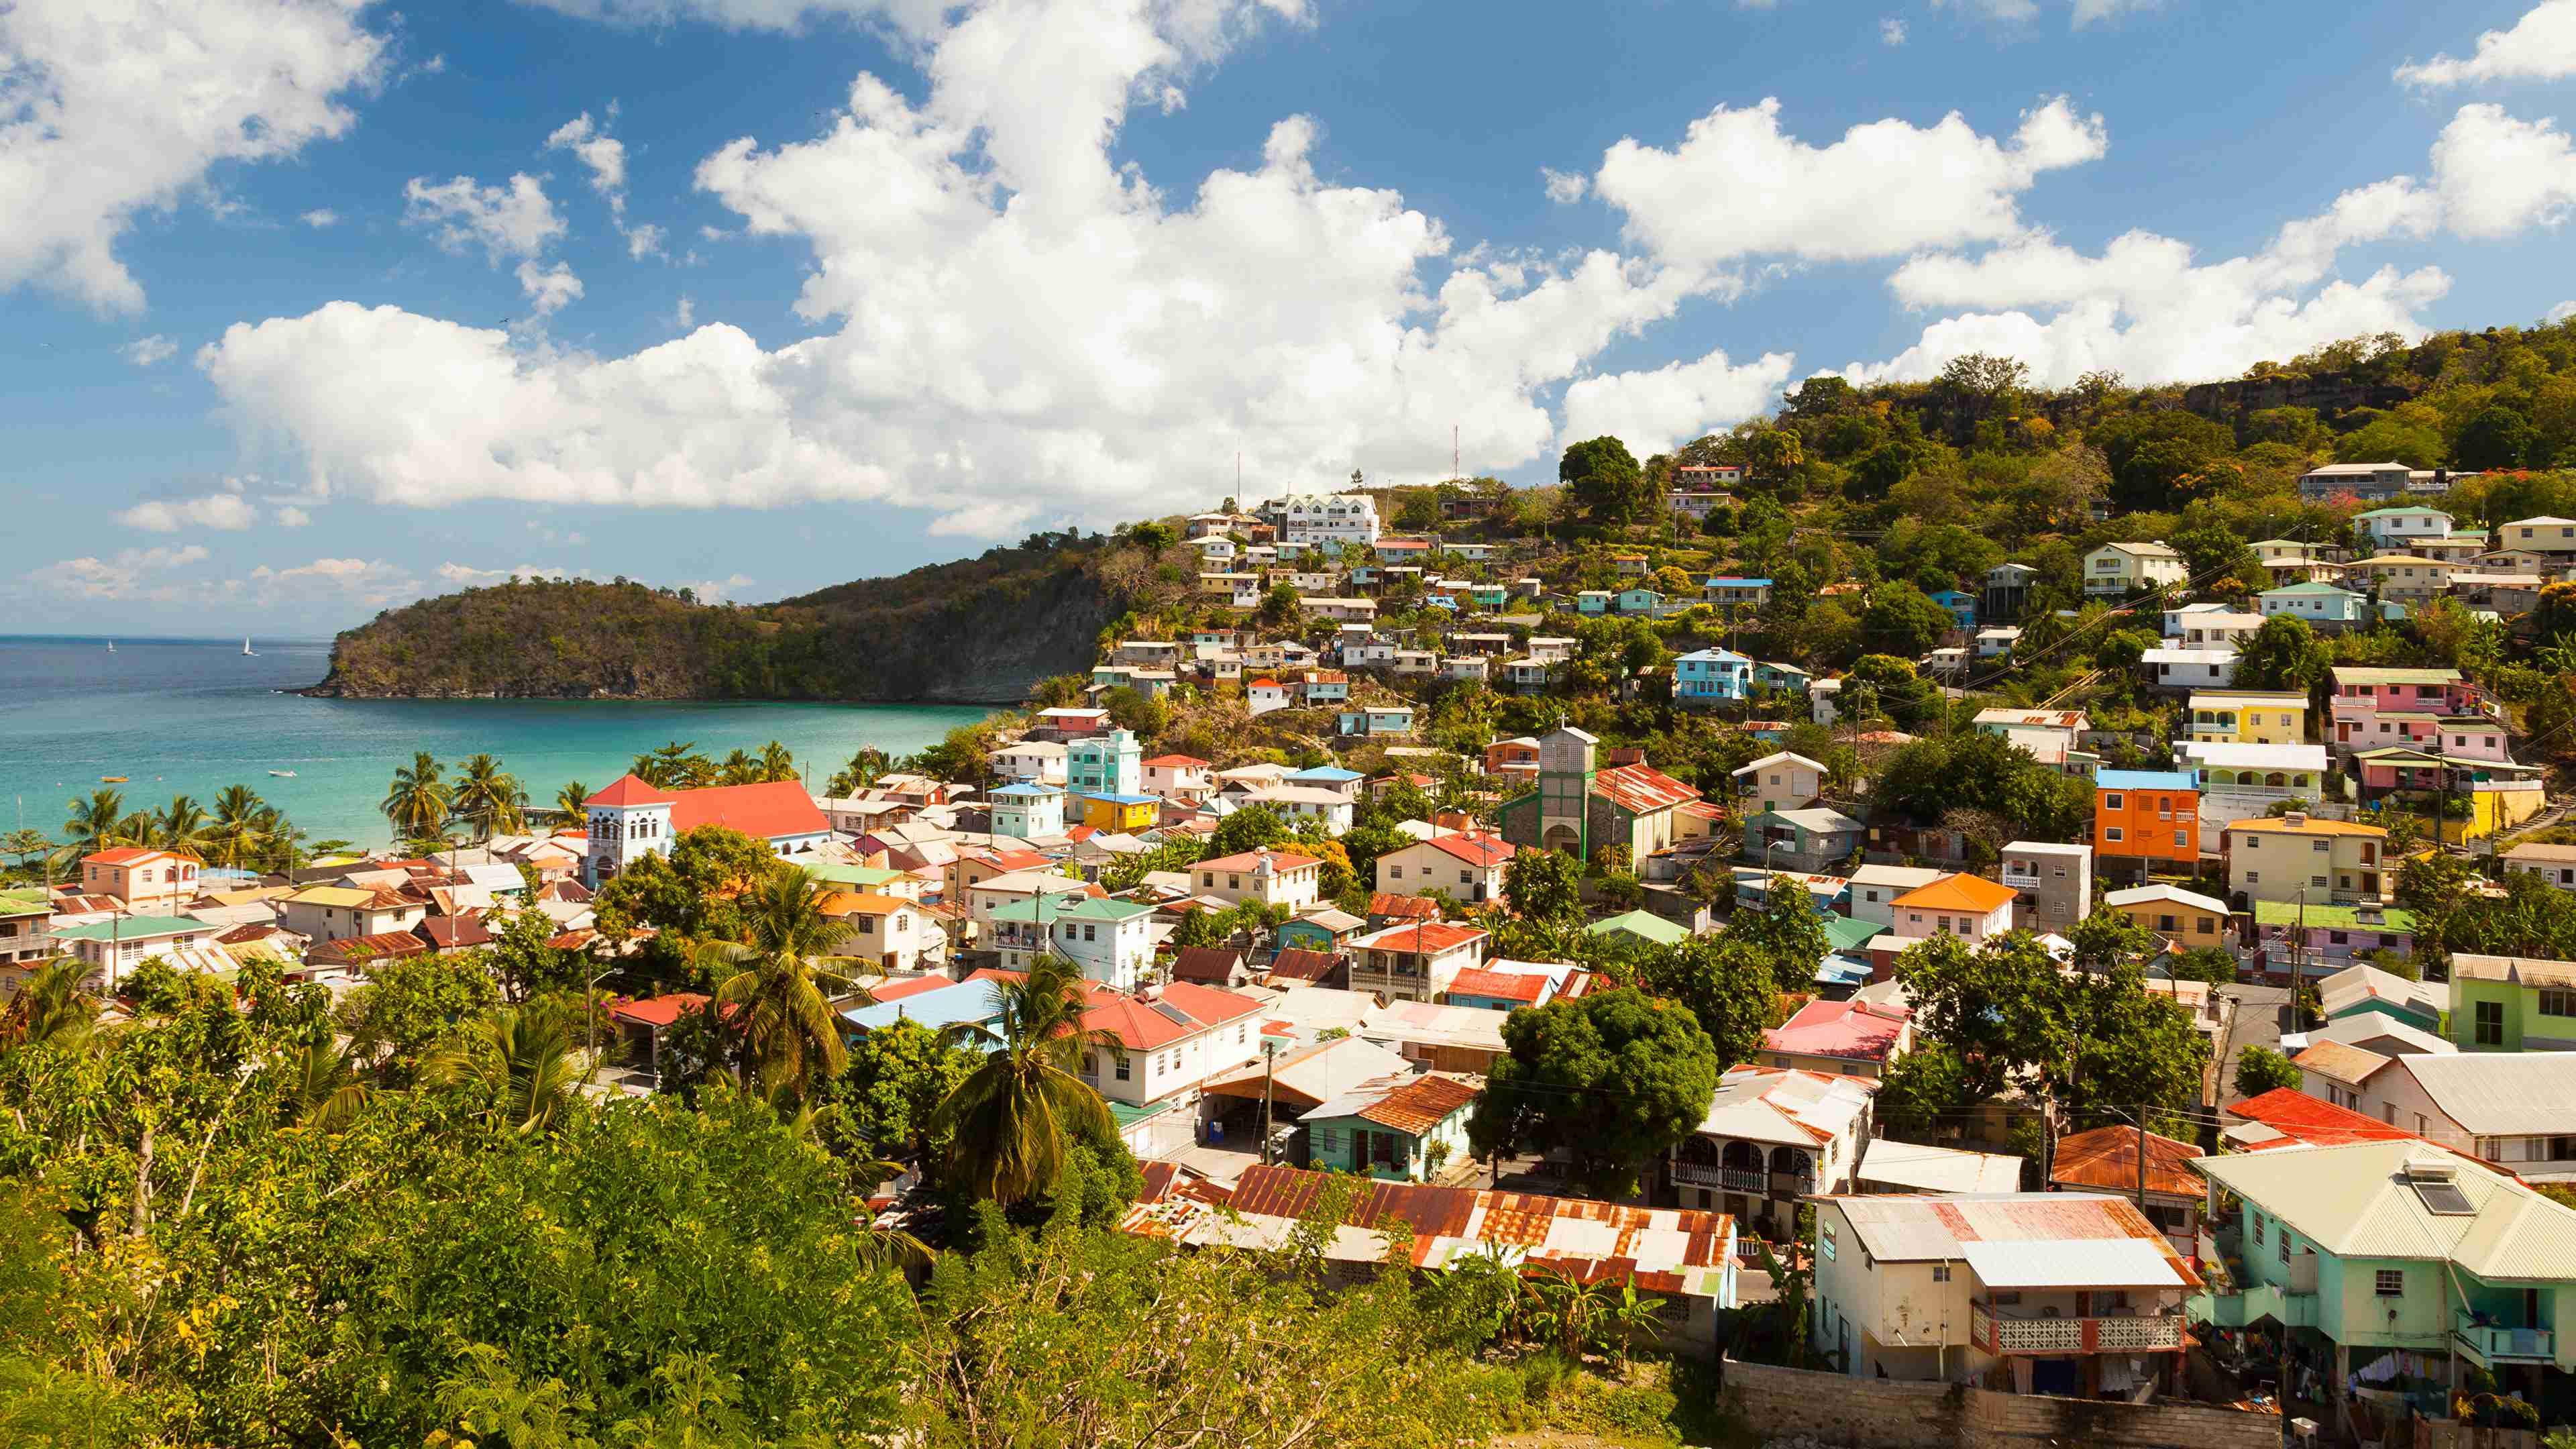 Houses Coast Saint Lucia Canary Islands Clouds 540980 3840x2160